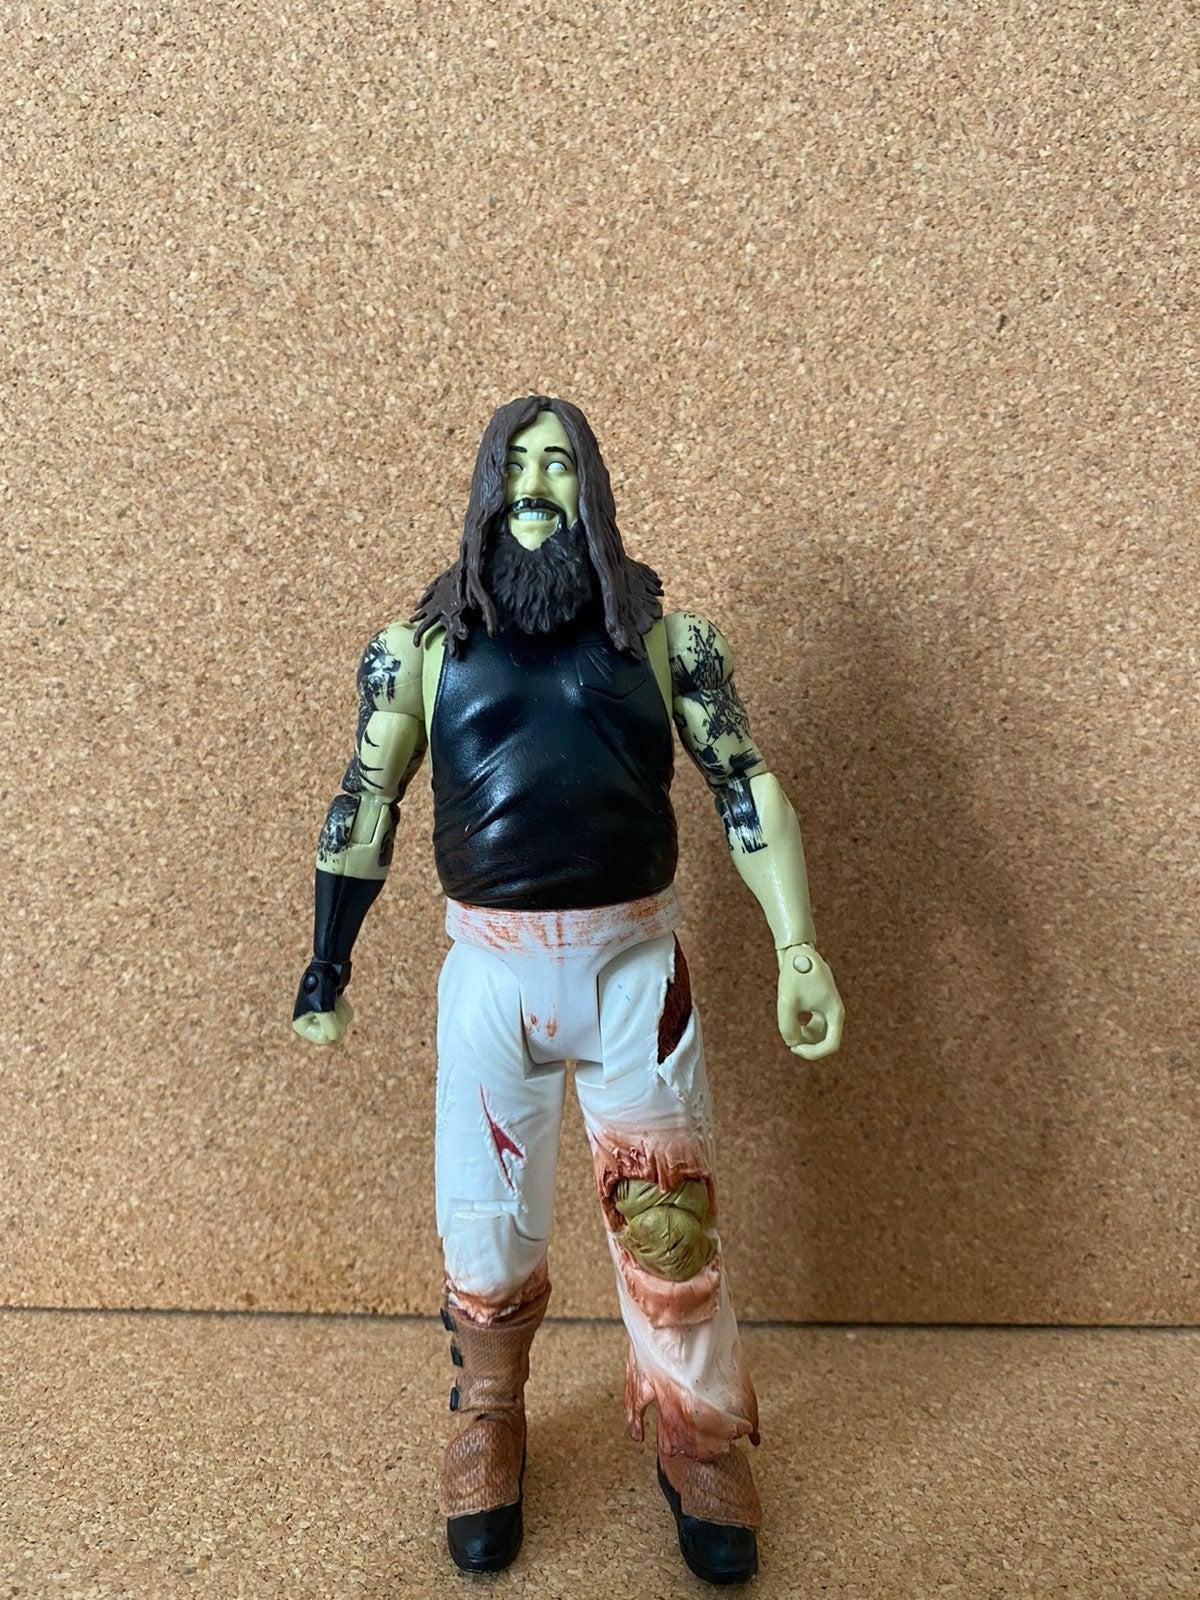 Bray Wyatt WWE Zombies Figure *LOOSE*